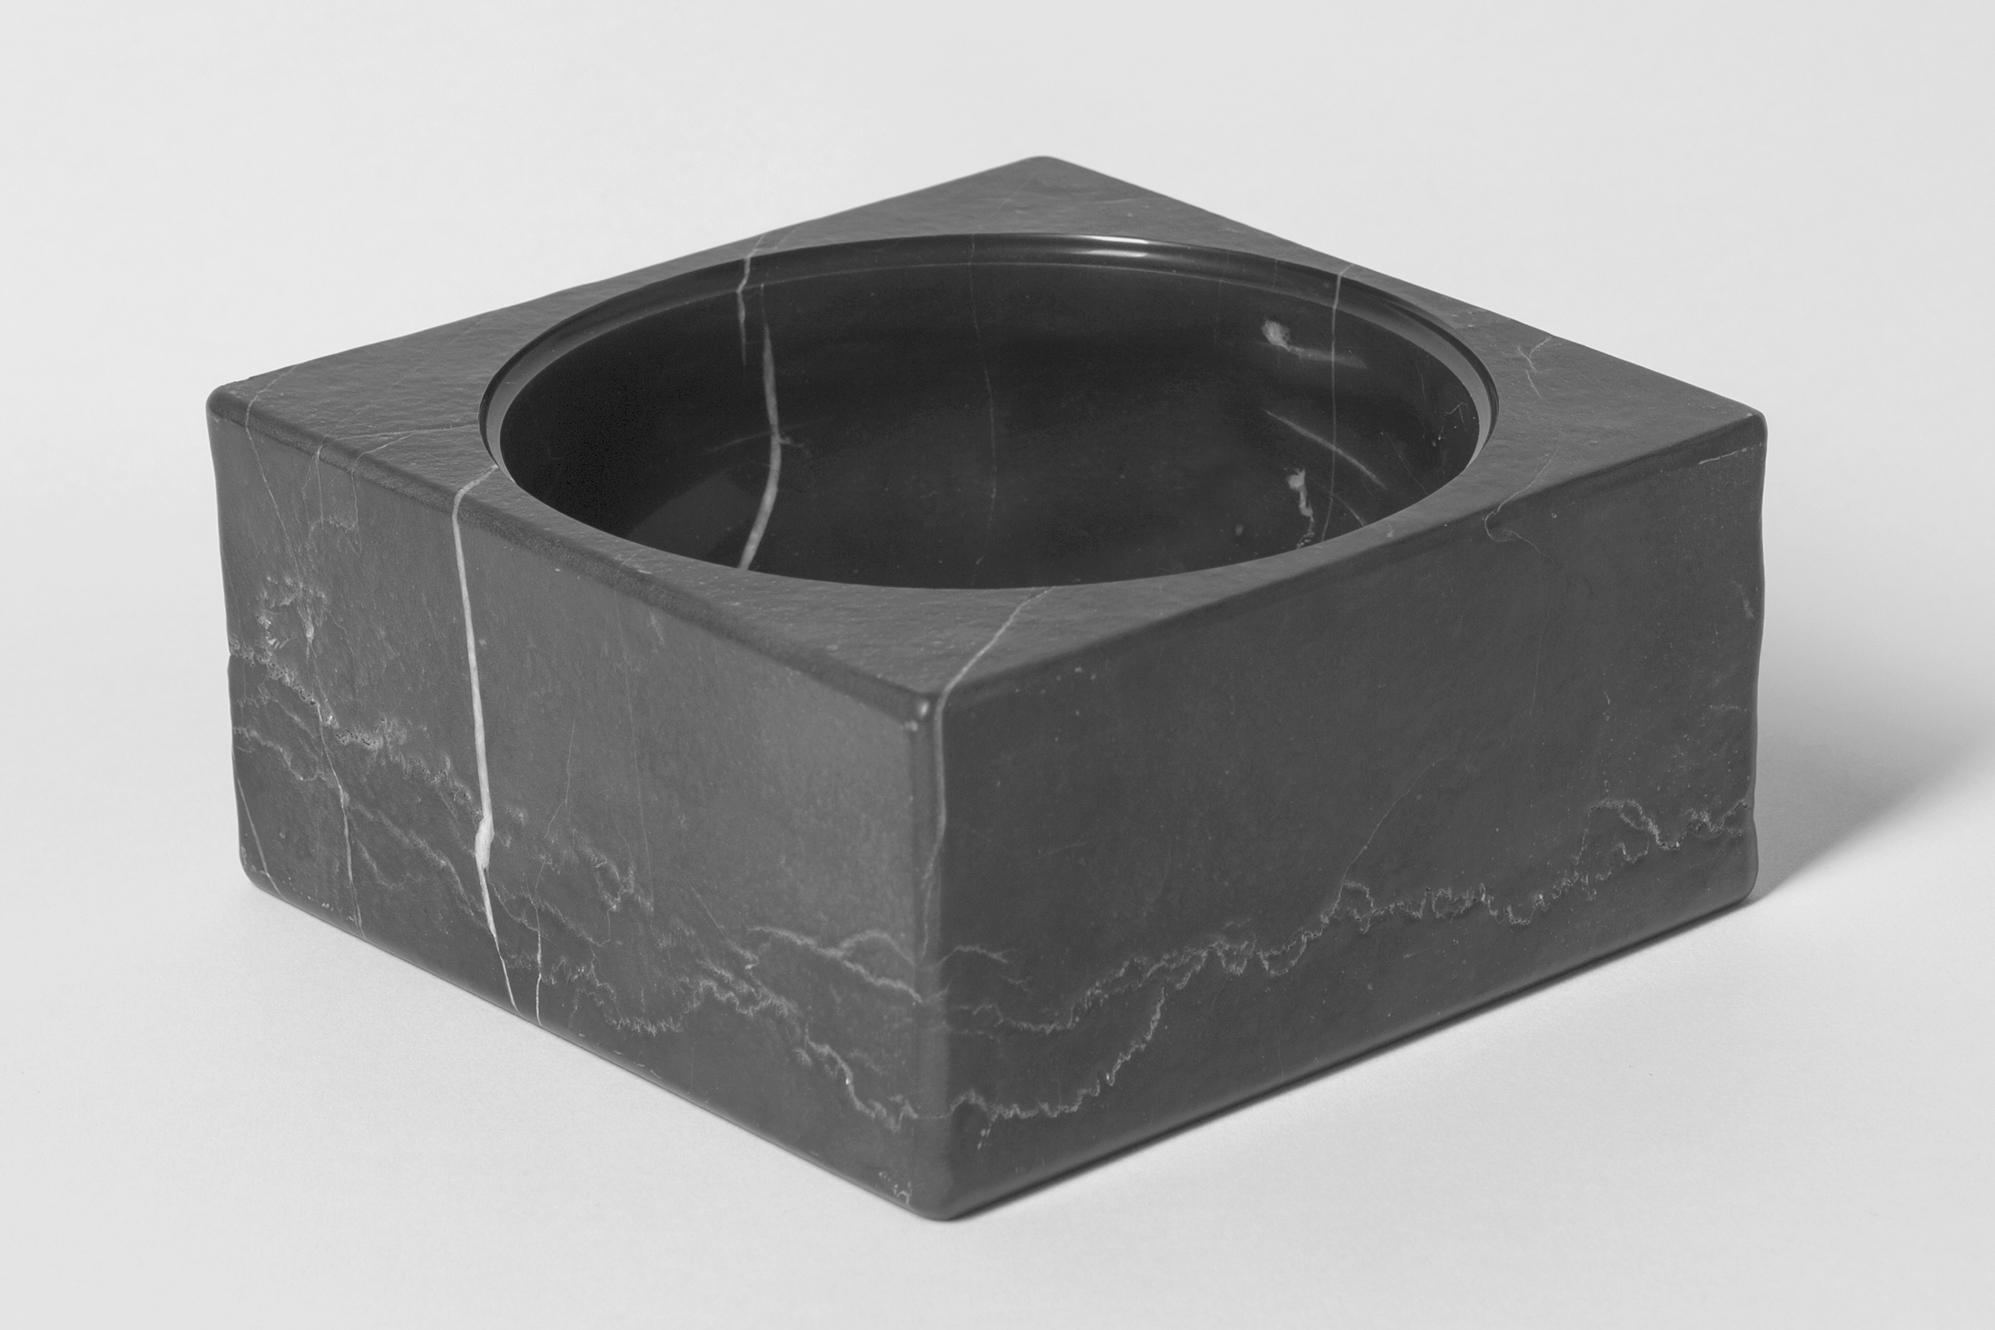 pk-marble-sculptural-piece-from-poul-kjaerholm-pk-600-and-pk-bowl-product-design_dezeen_hero.jpg